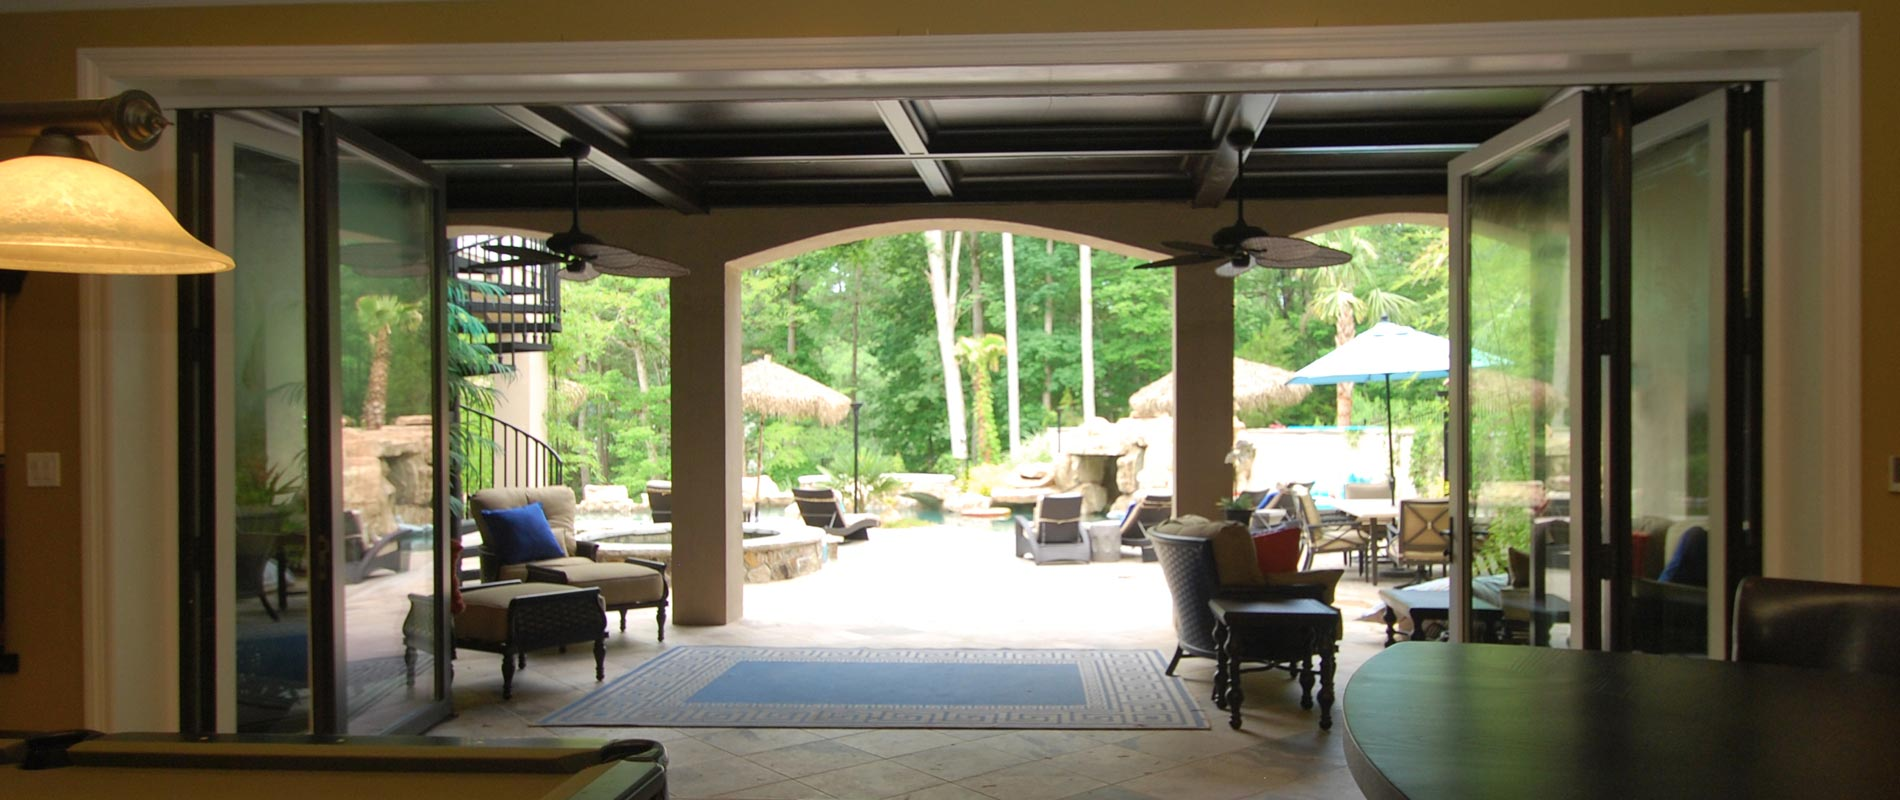 Recreational Area Renovation | Complete Construction Company | Apex, NC